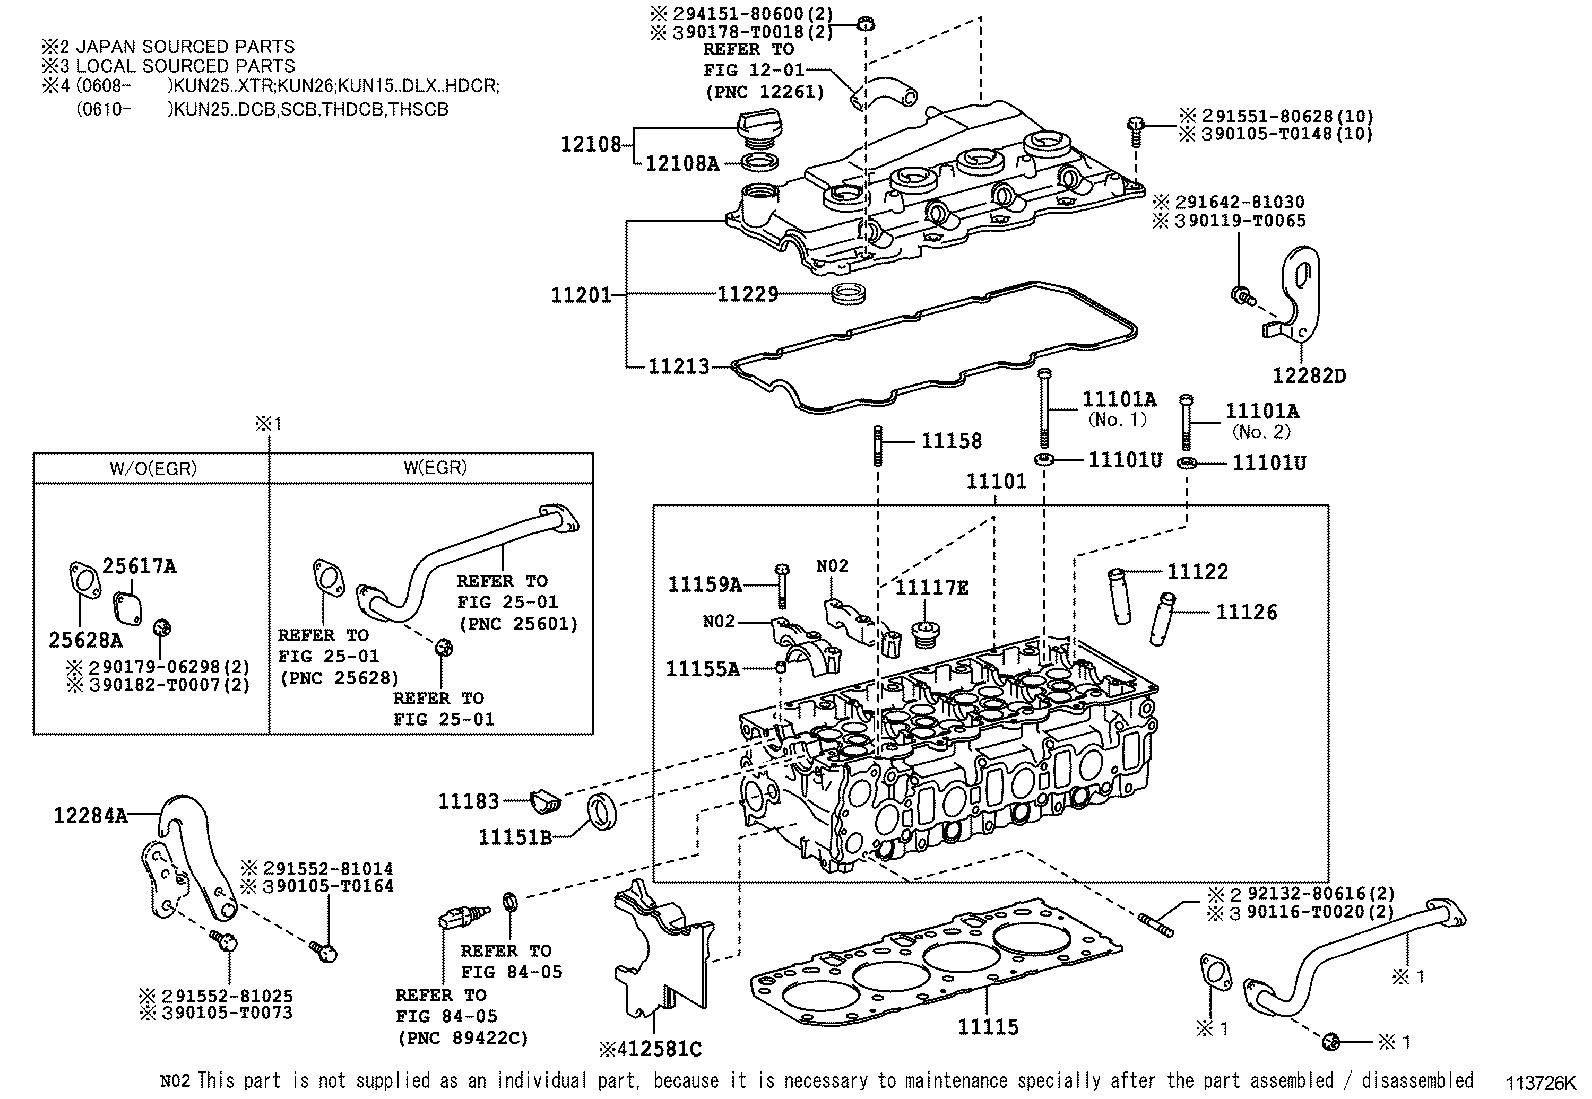 22re Valve Diagram - Wiring Diagrams Schema